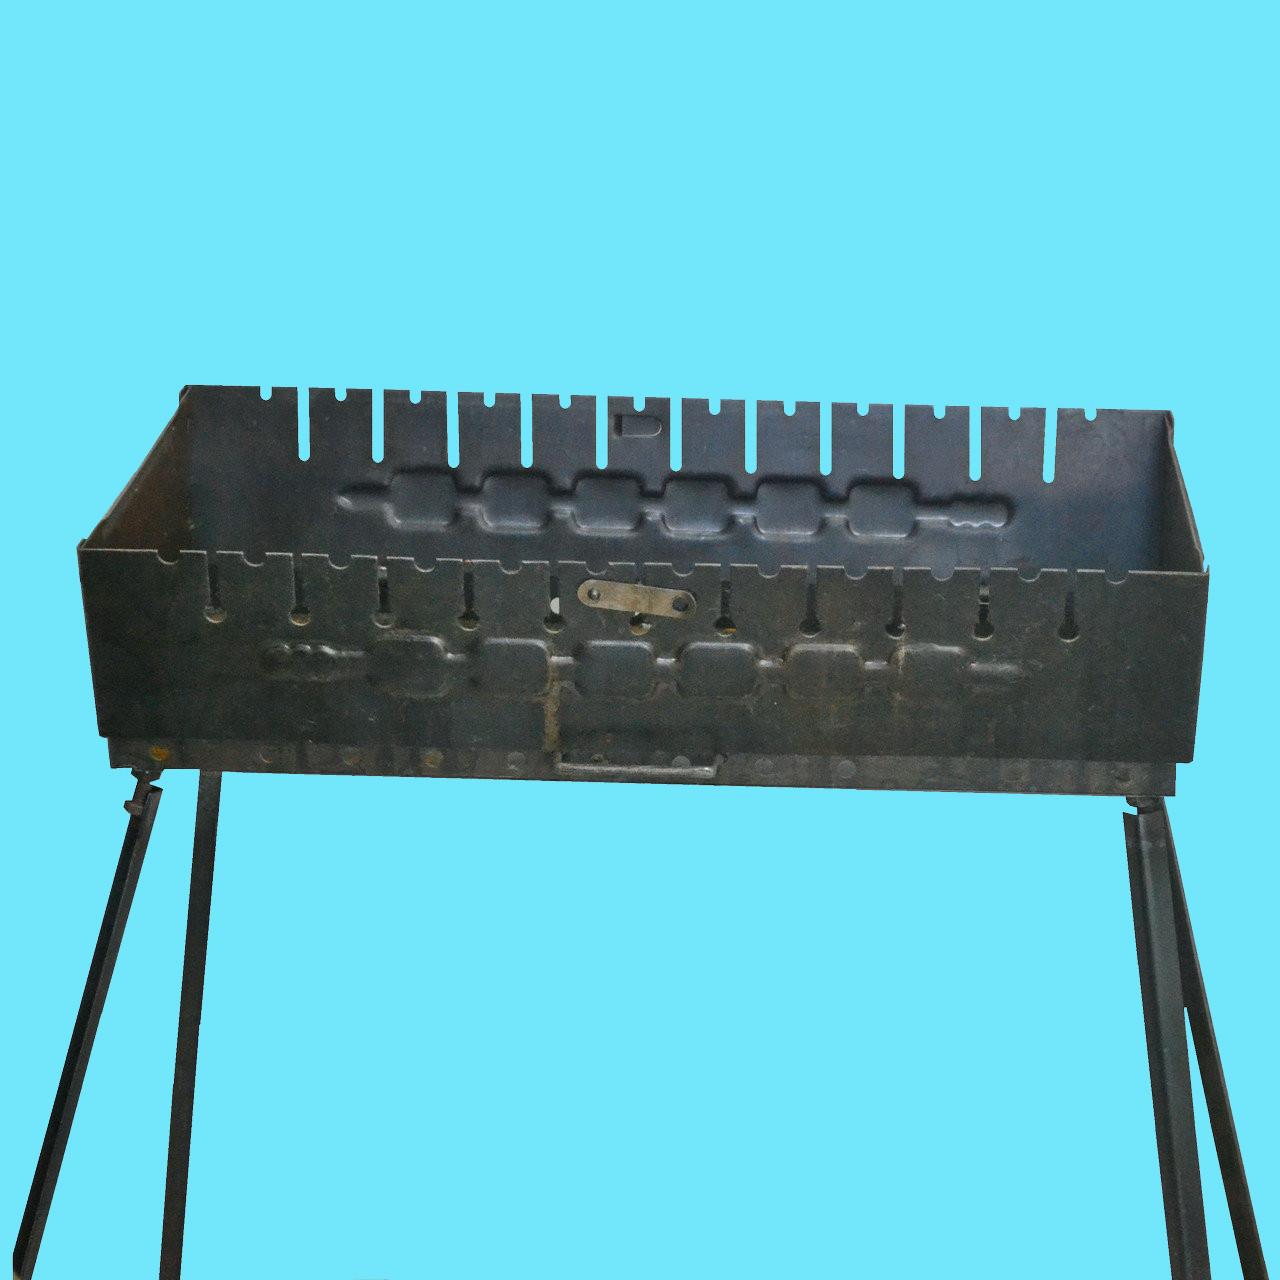 Мангал - чемодан 2 мм на 12 шампуров